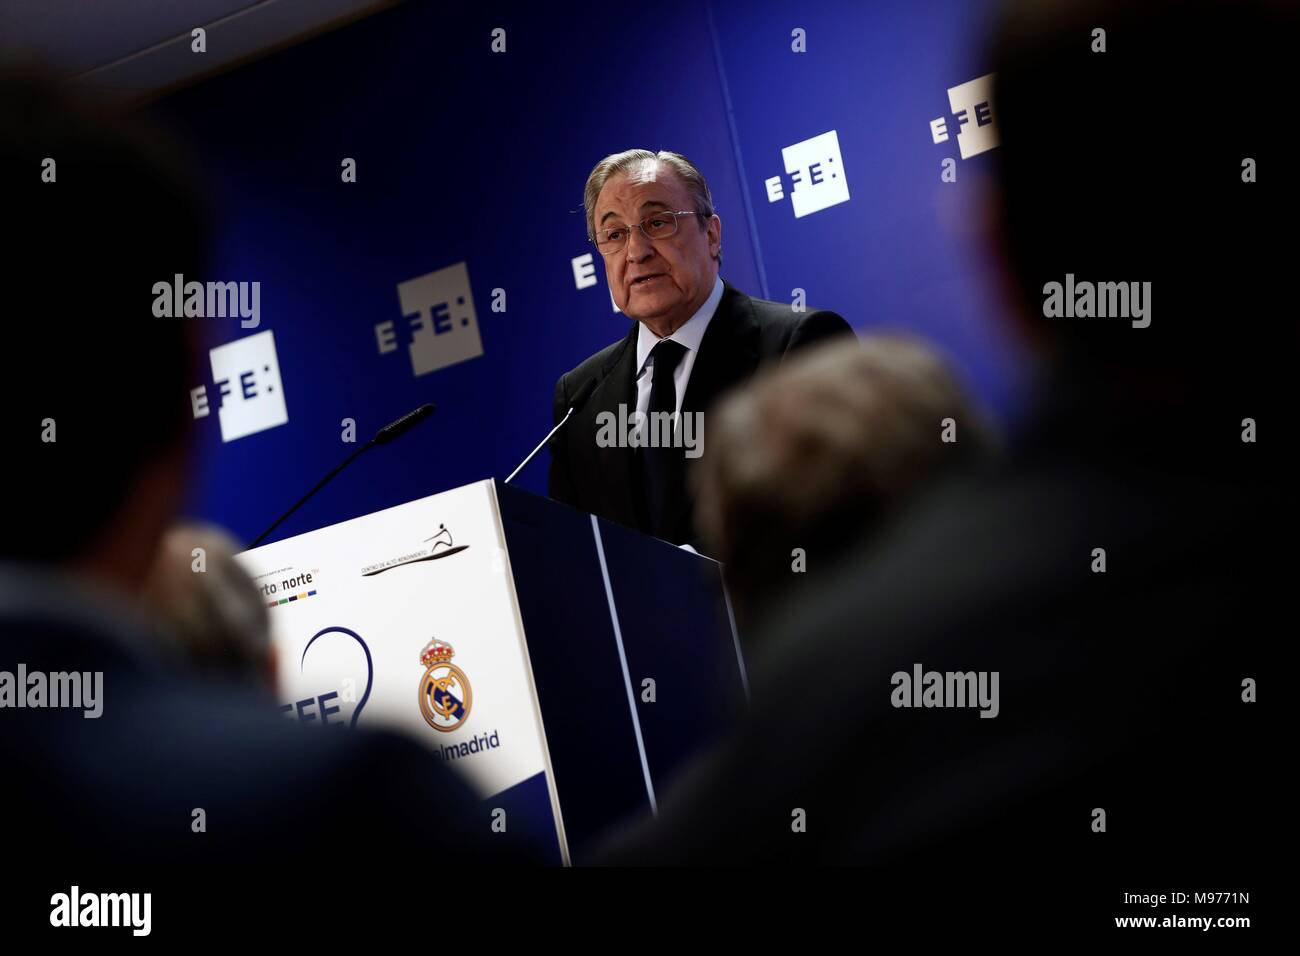 Madrid, Spain  23rd Mar, 2018  President of Real Madrid, Florentino